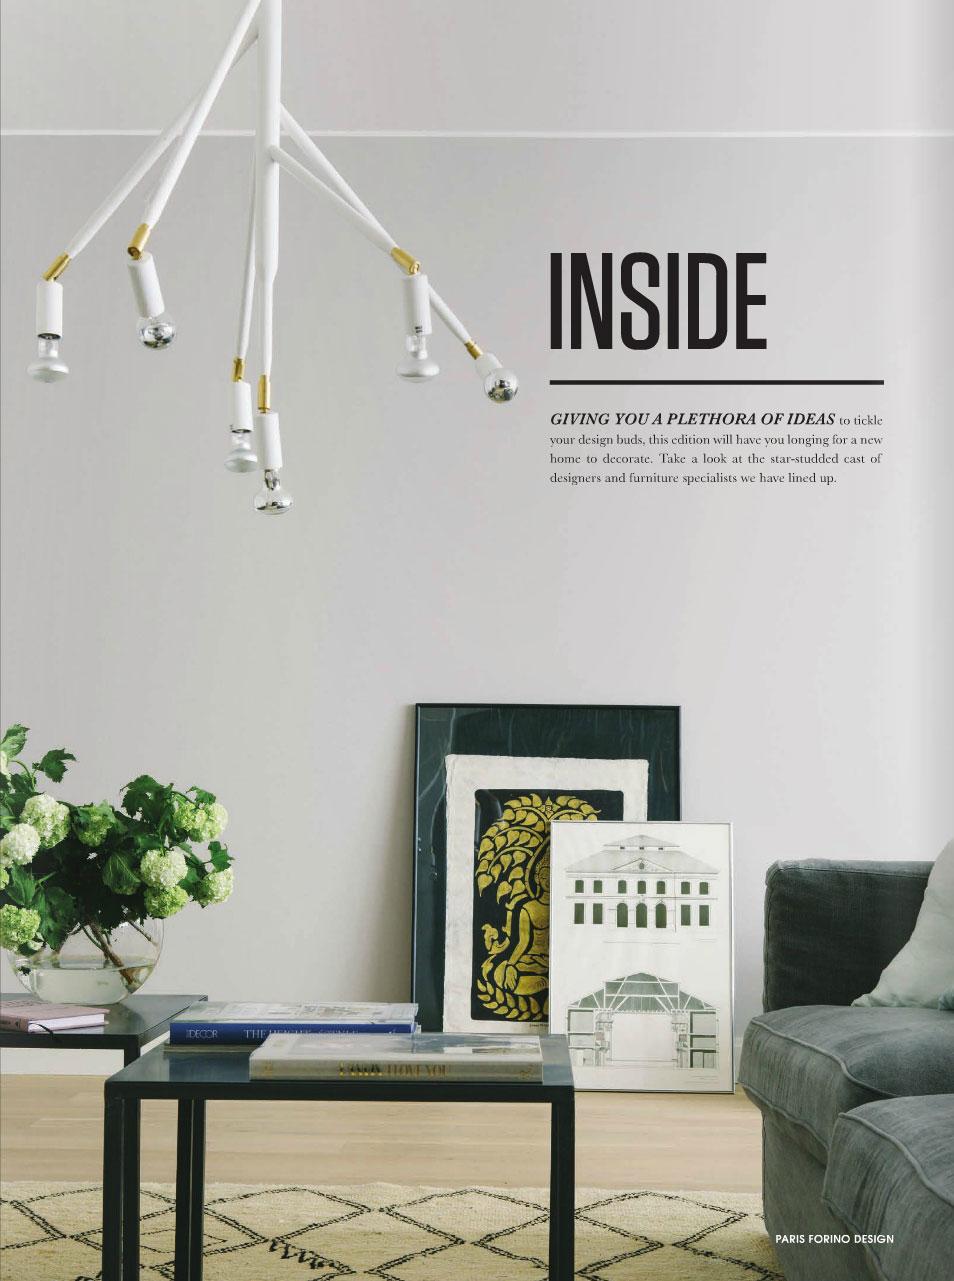 Florida Interior design firm on 9FI5TH